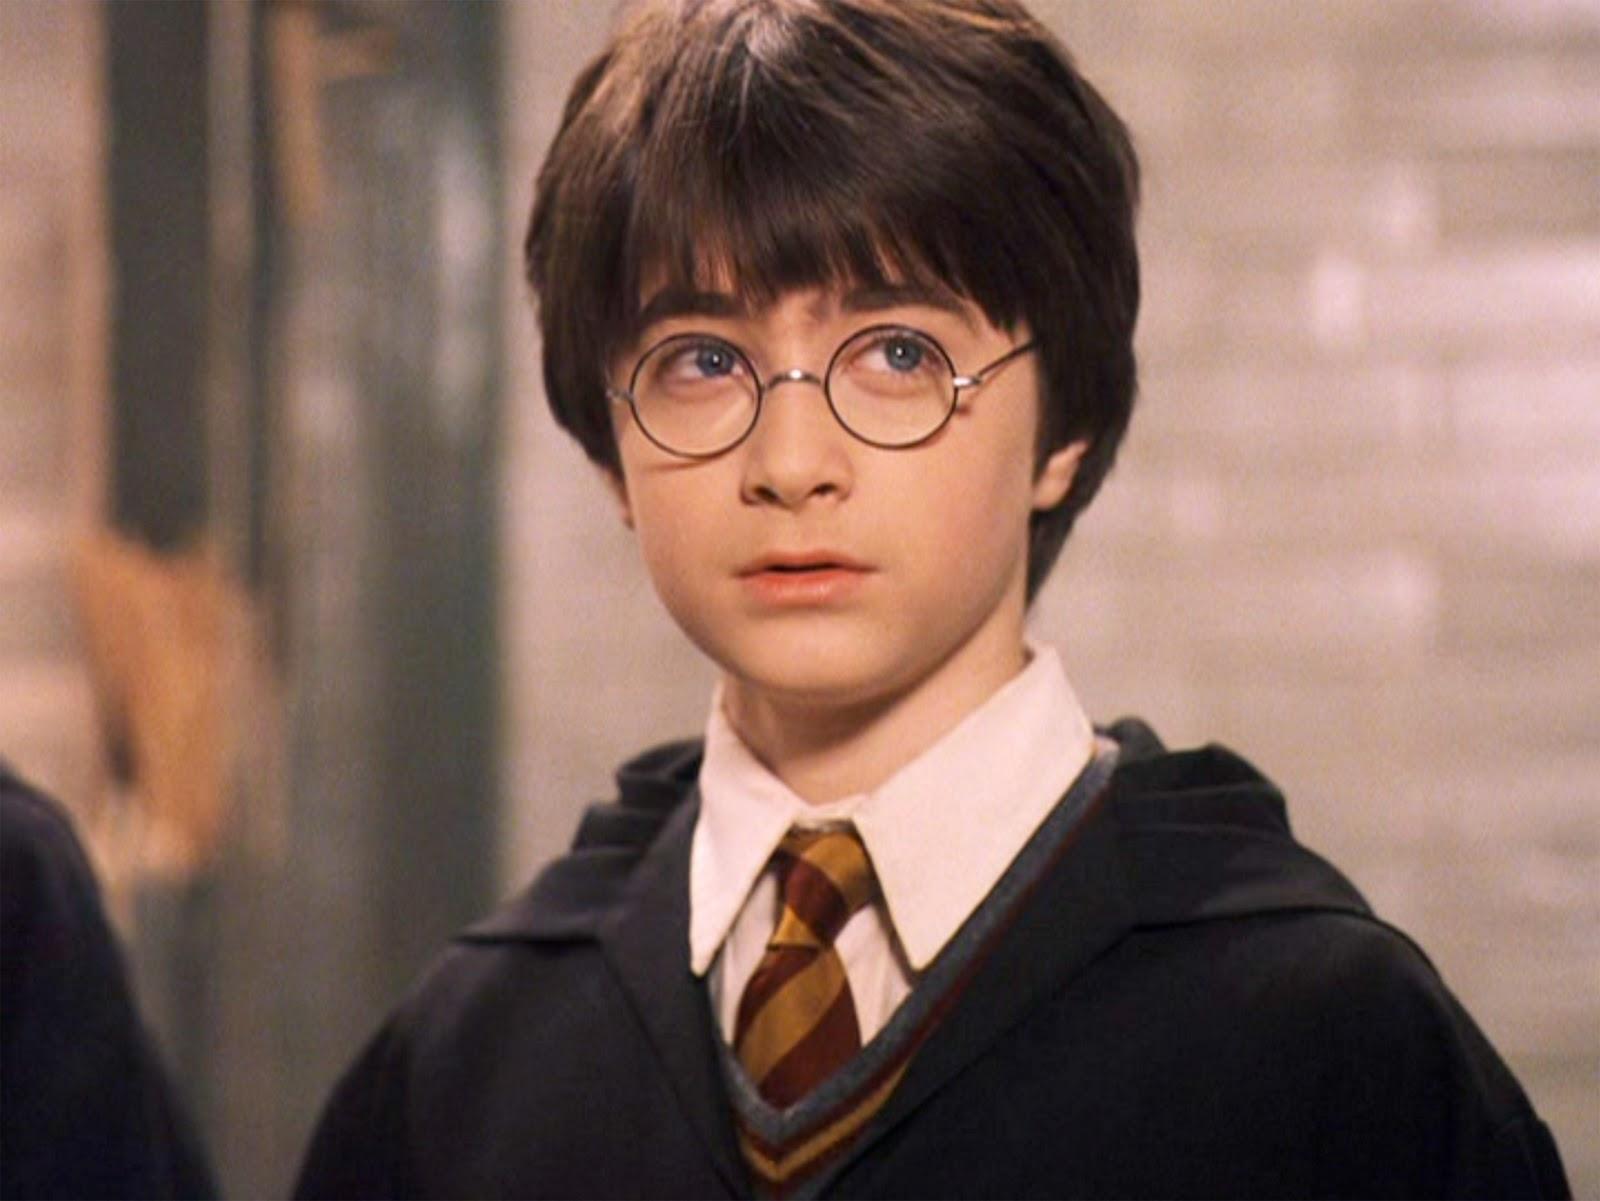 new arrival 1034a 174f1 Harry Potter details that make no sense